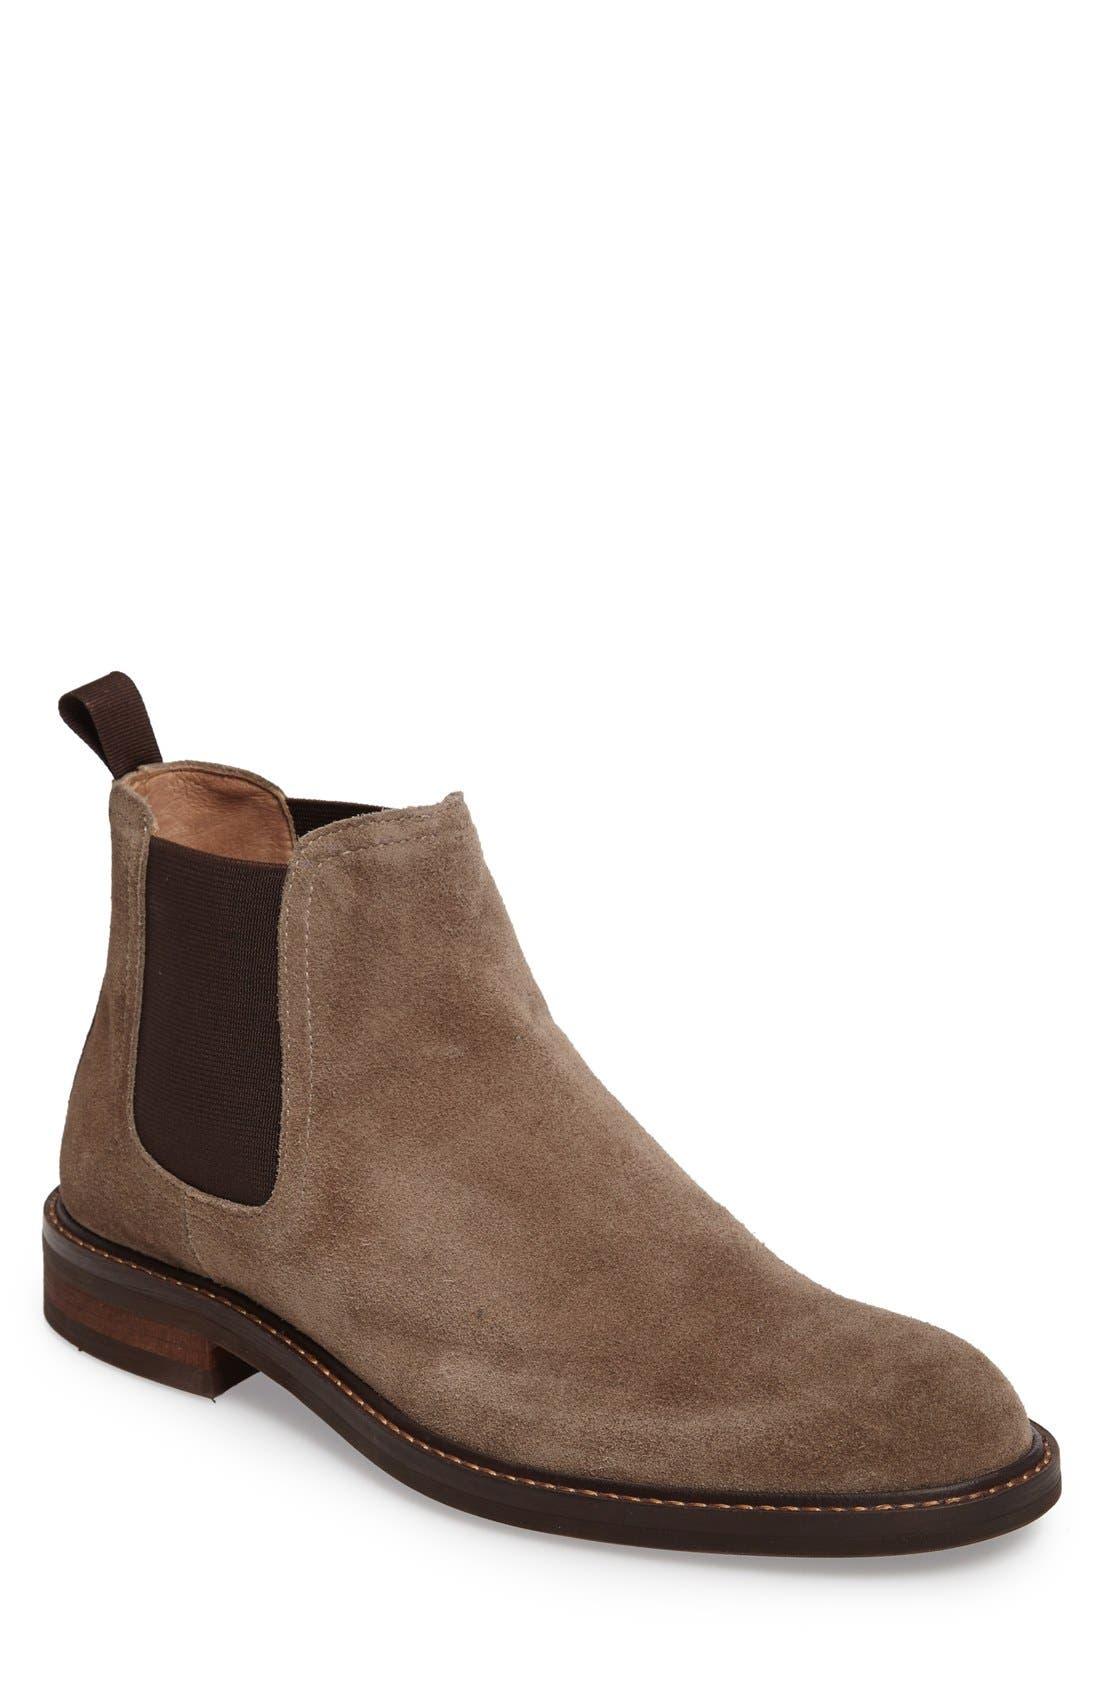 Horton Chelsea Boot,                             Main thumbnail 9, color,